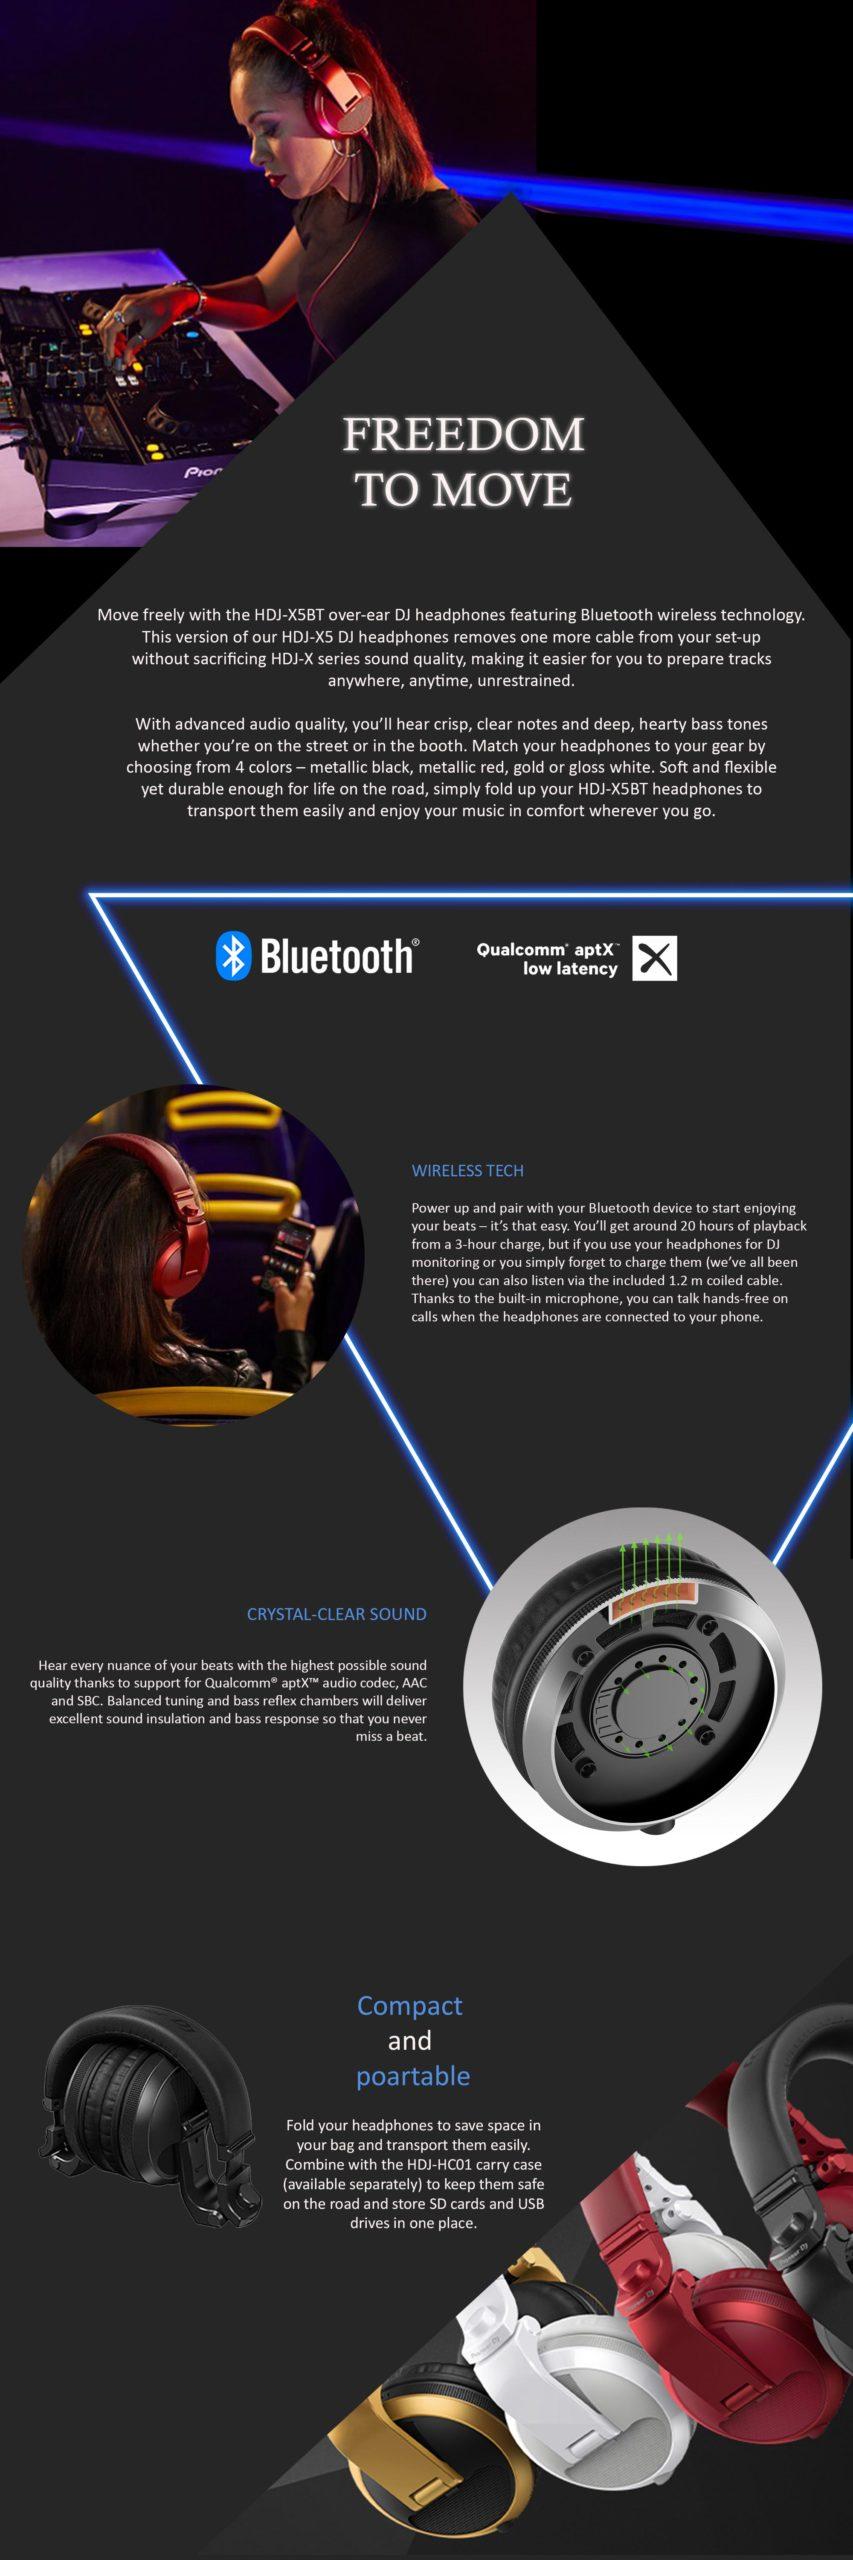 Pioneer HDJ-X5BT Headphones With Bluetooth - Κόκκινο - - HDJ-X5BT-R